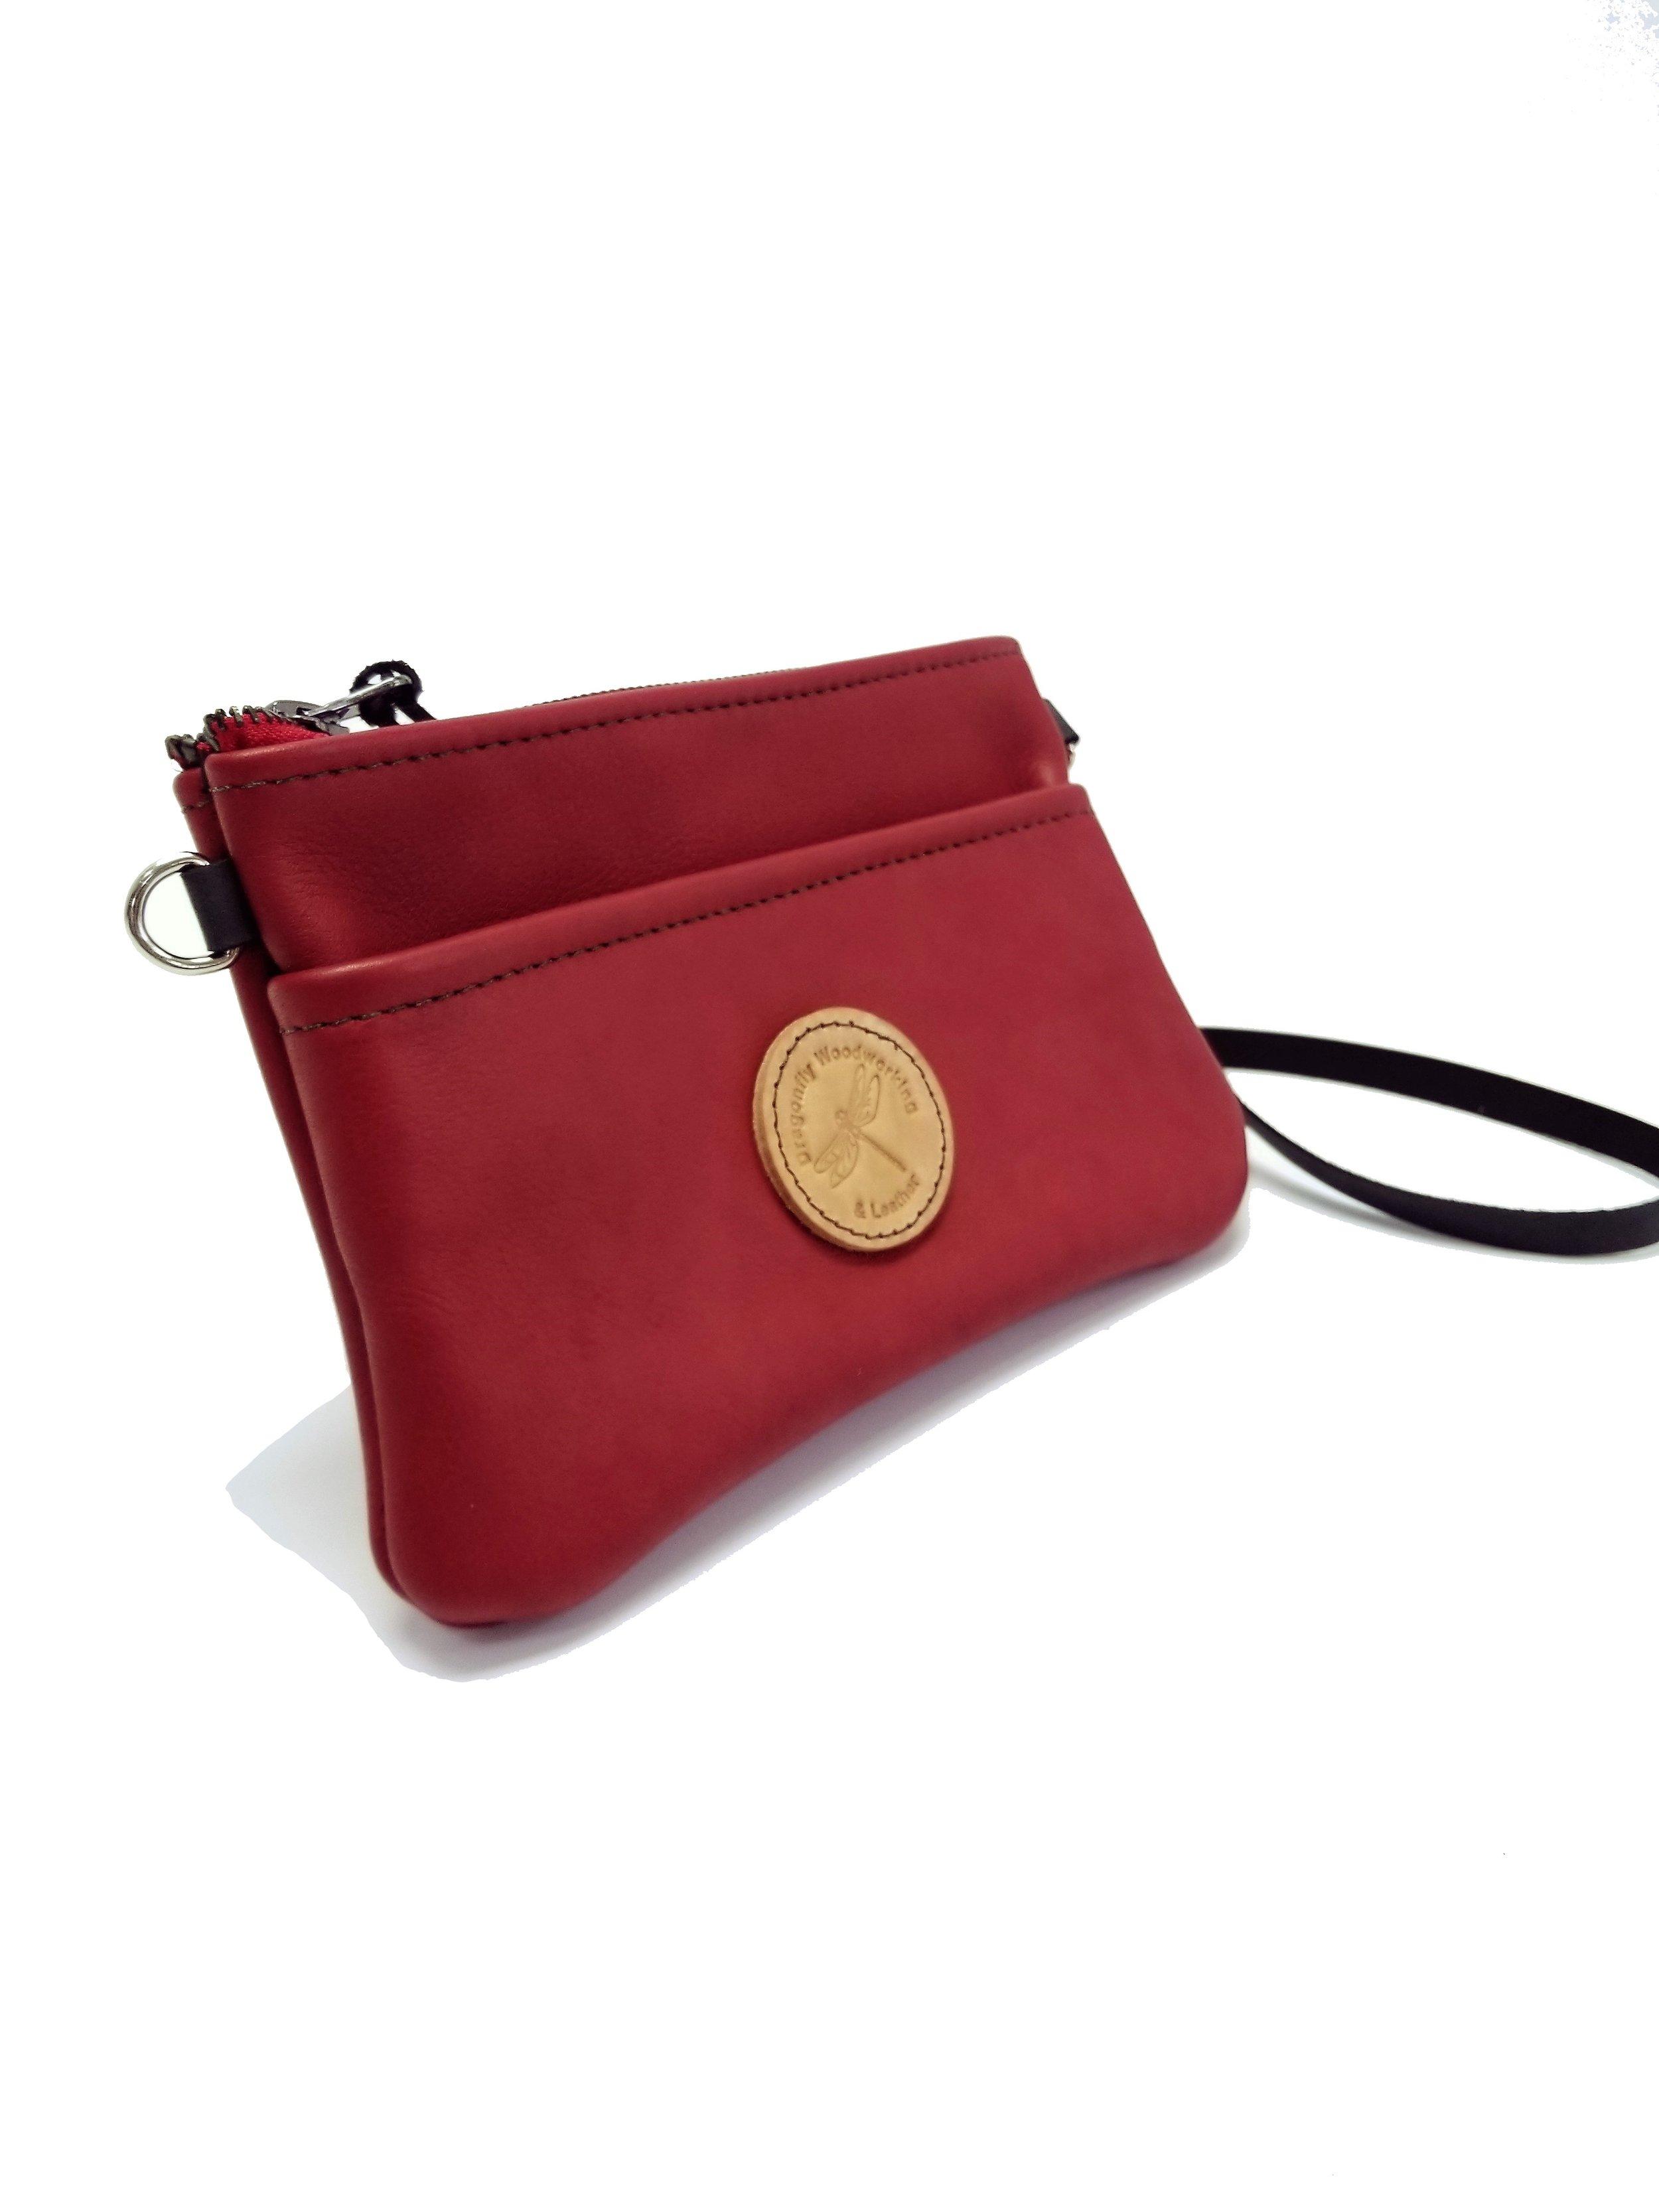 Leather clutch - leather purse - Tina Marie Clutch